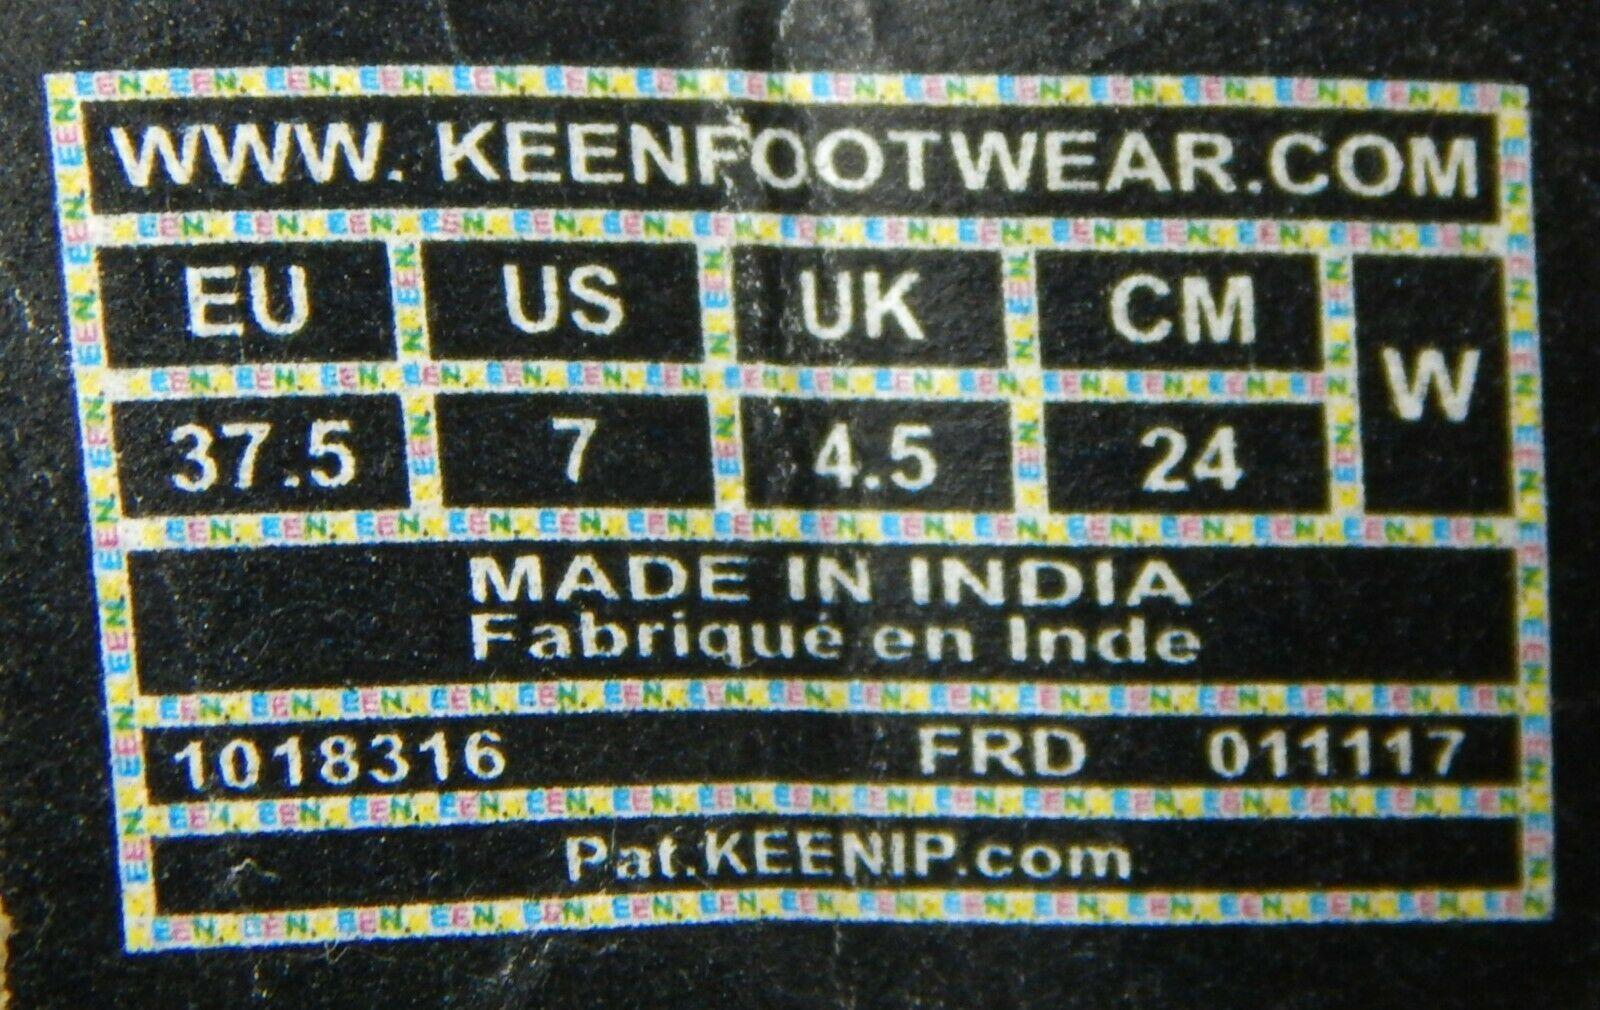 Keen Presidio II Misura 7 M (B) Eu 37.5 Donna Casual Oxford Shoes Paloma 1018316 image 10